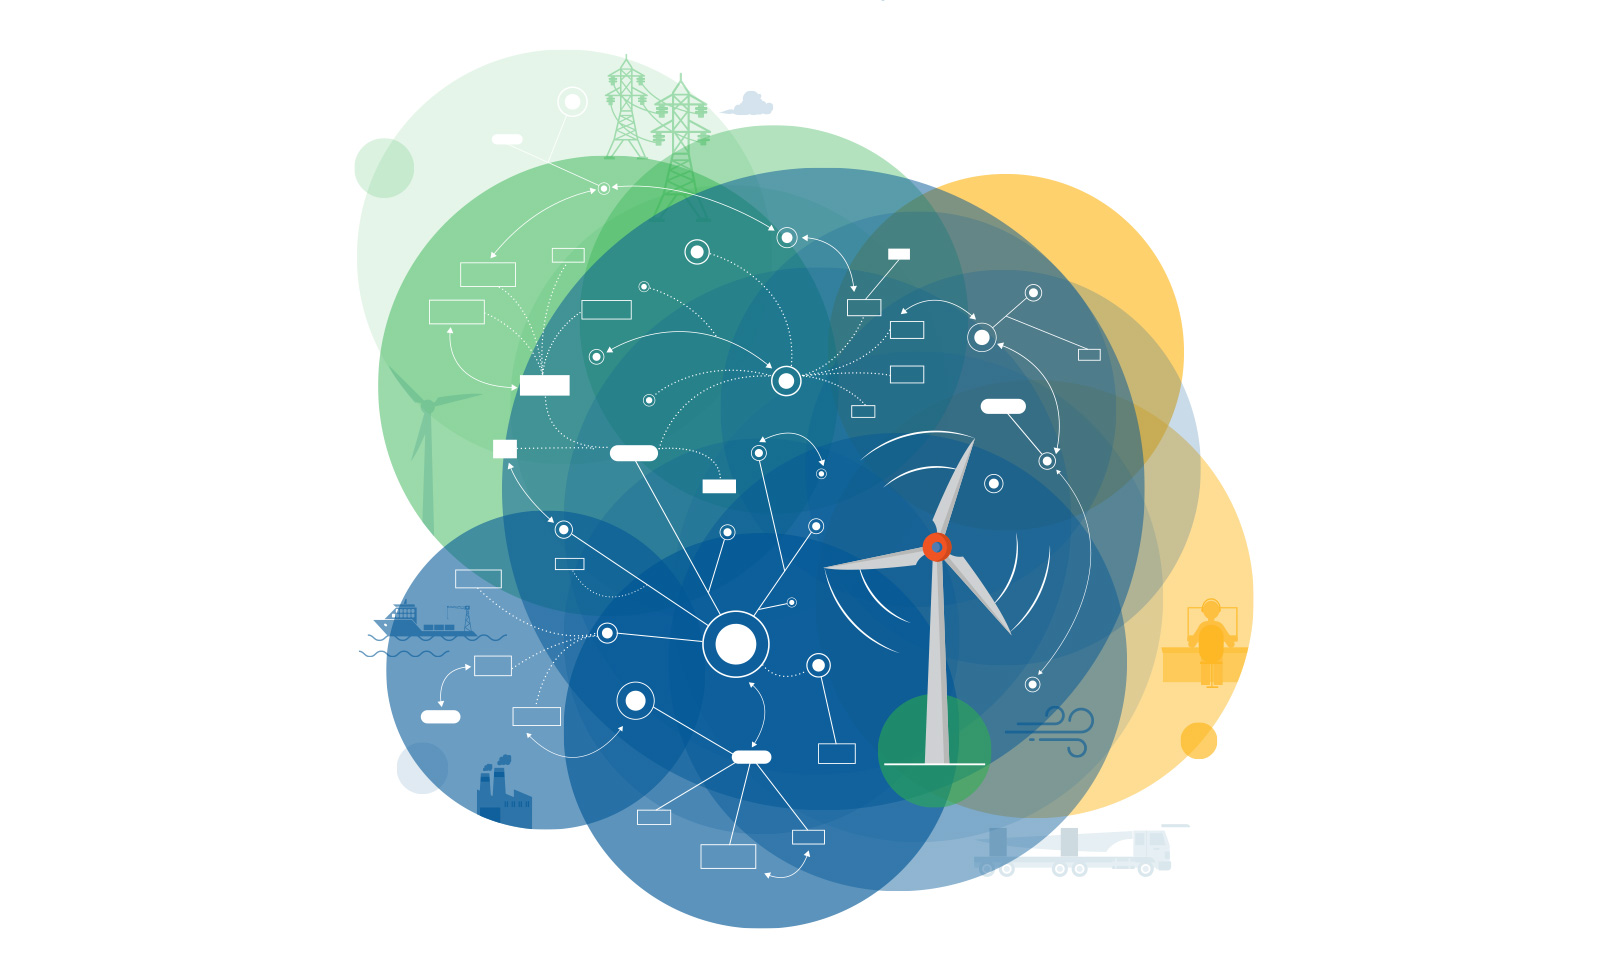 ETIPWind – European Technology and Innovation Platform on